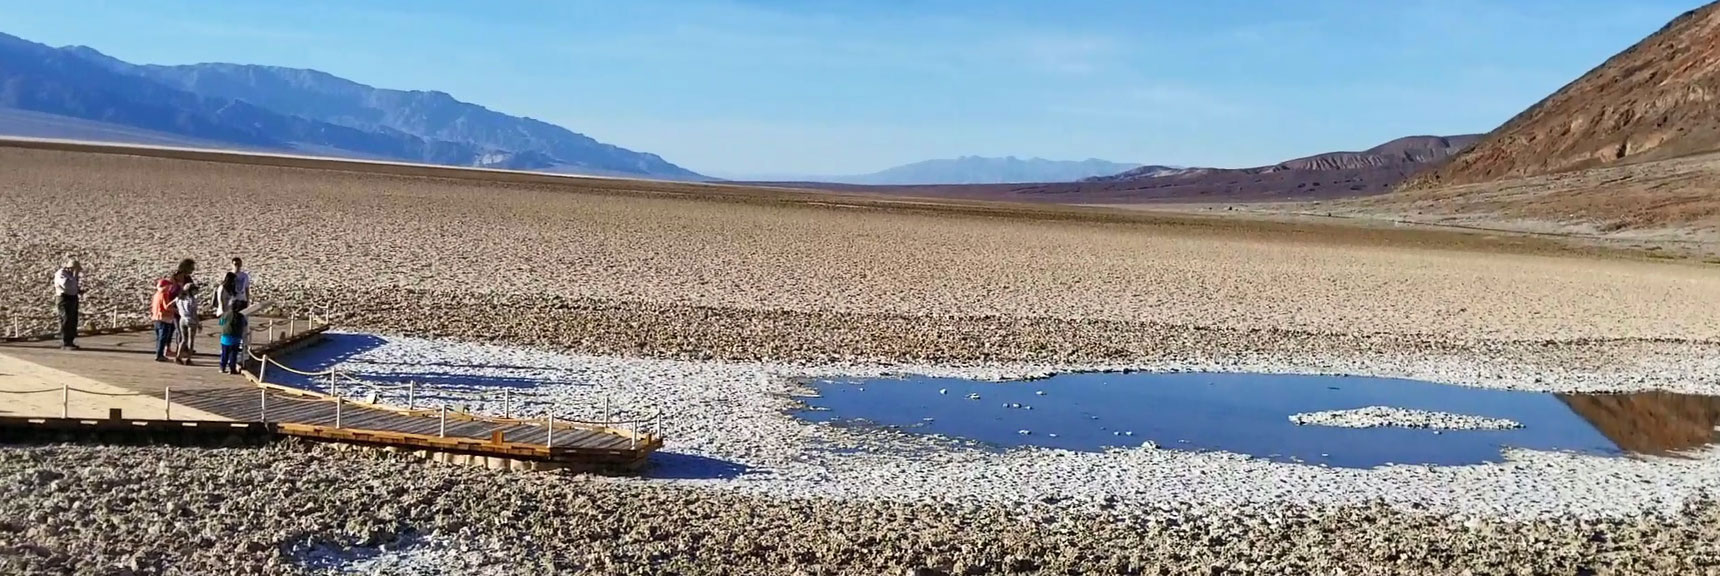 Death Valley National Park Bad Water Basin November 24th 2018